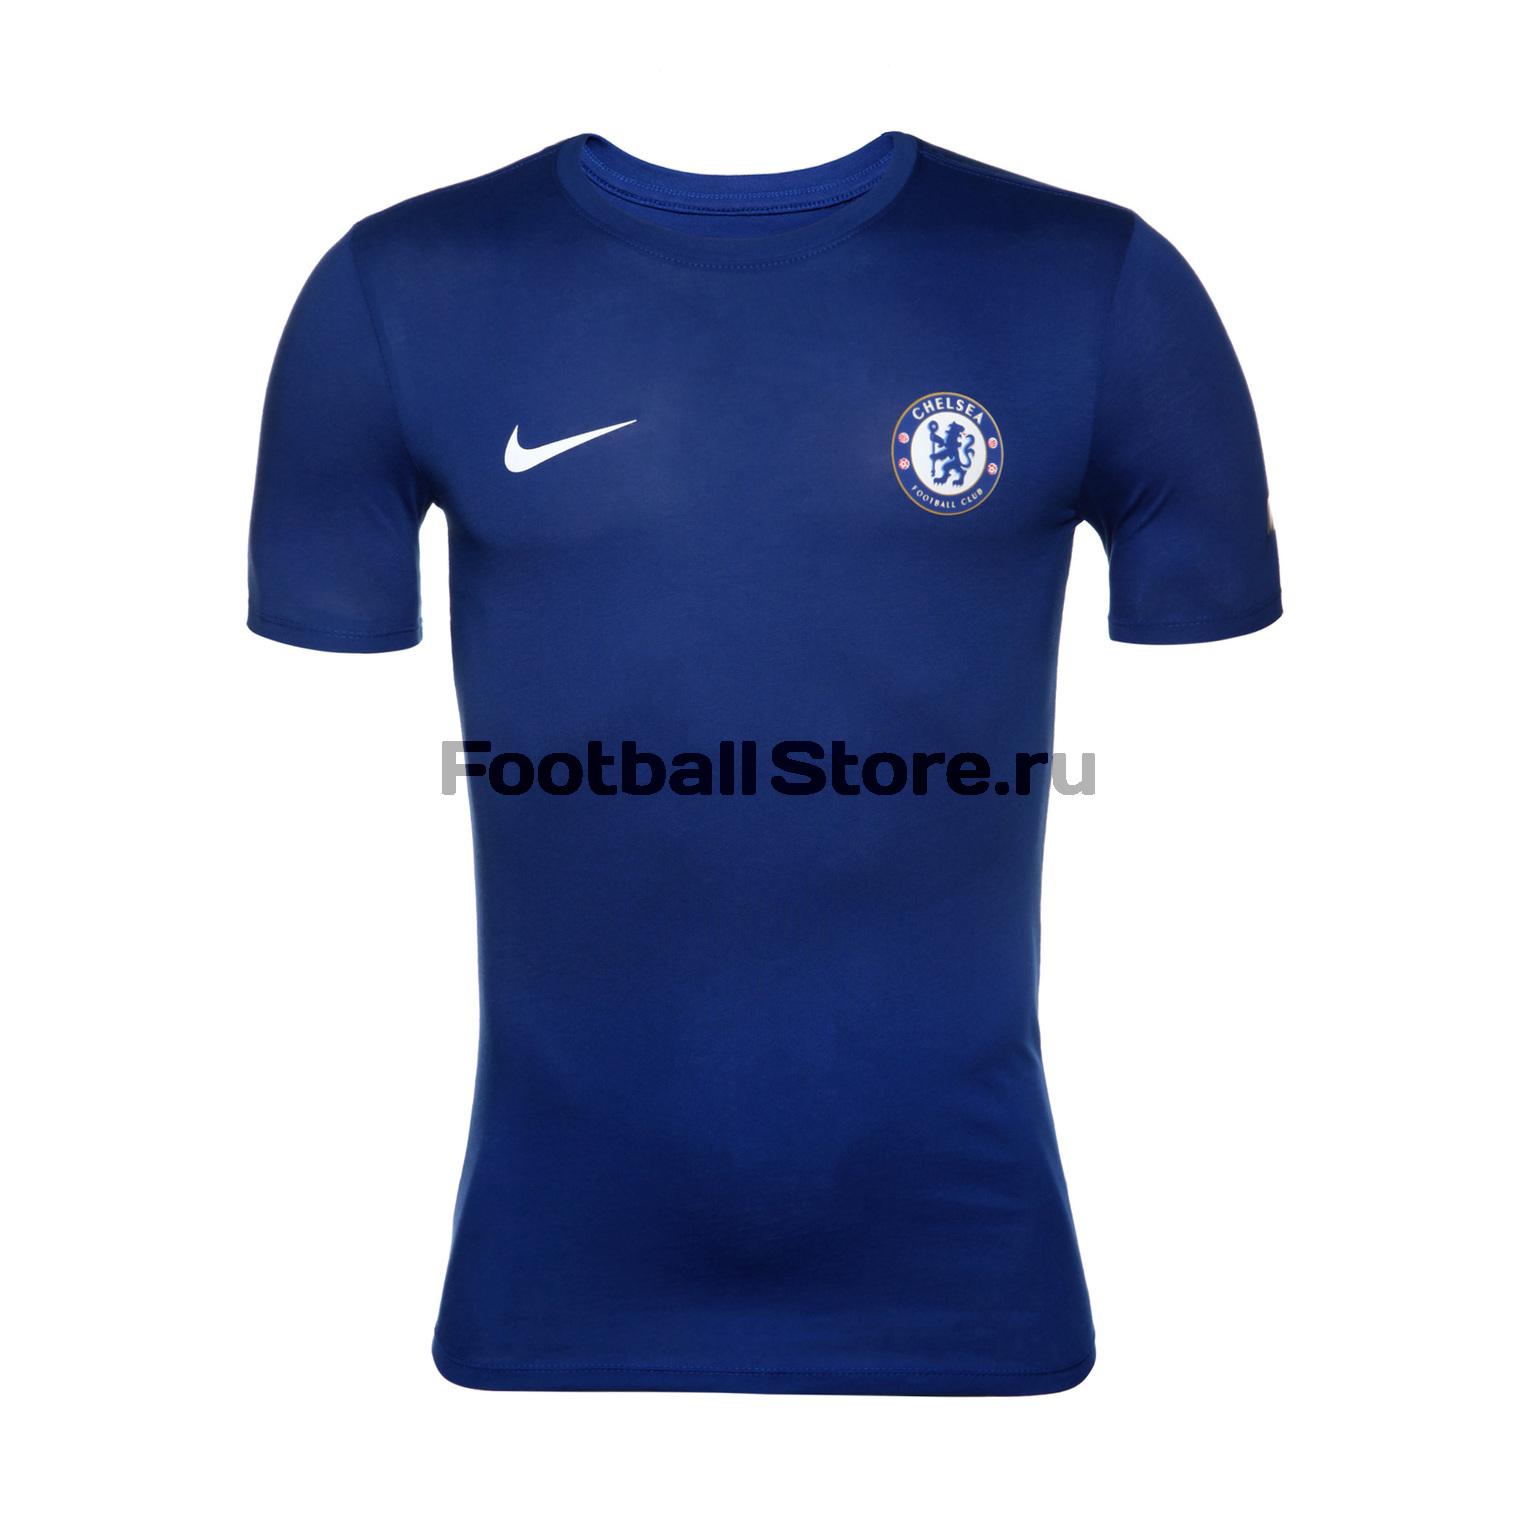 Chelsea Nike Футболка Nike Chelsea Tee Crest 921760-495 футболка jslv футболка life tee